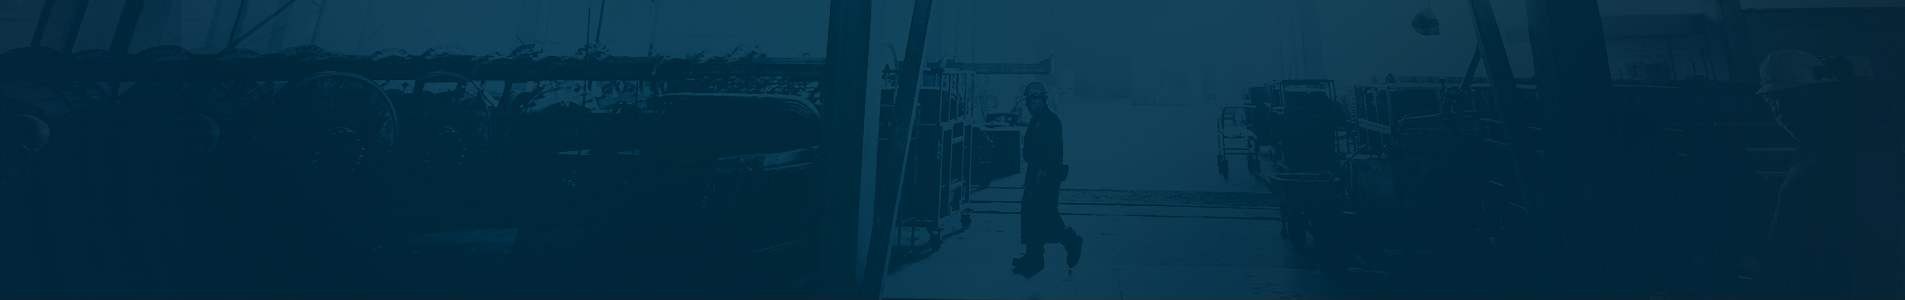 Worker waling in warehouse